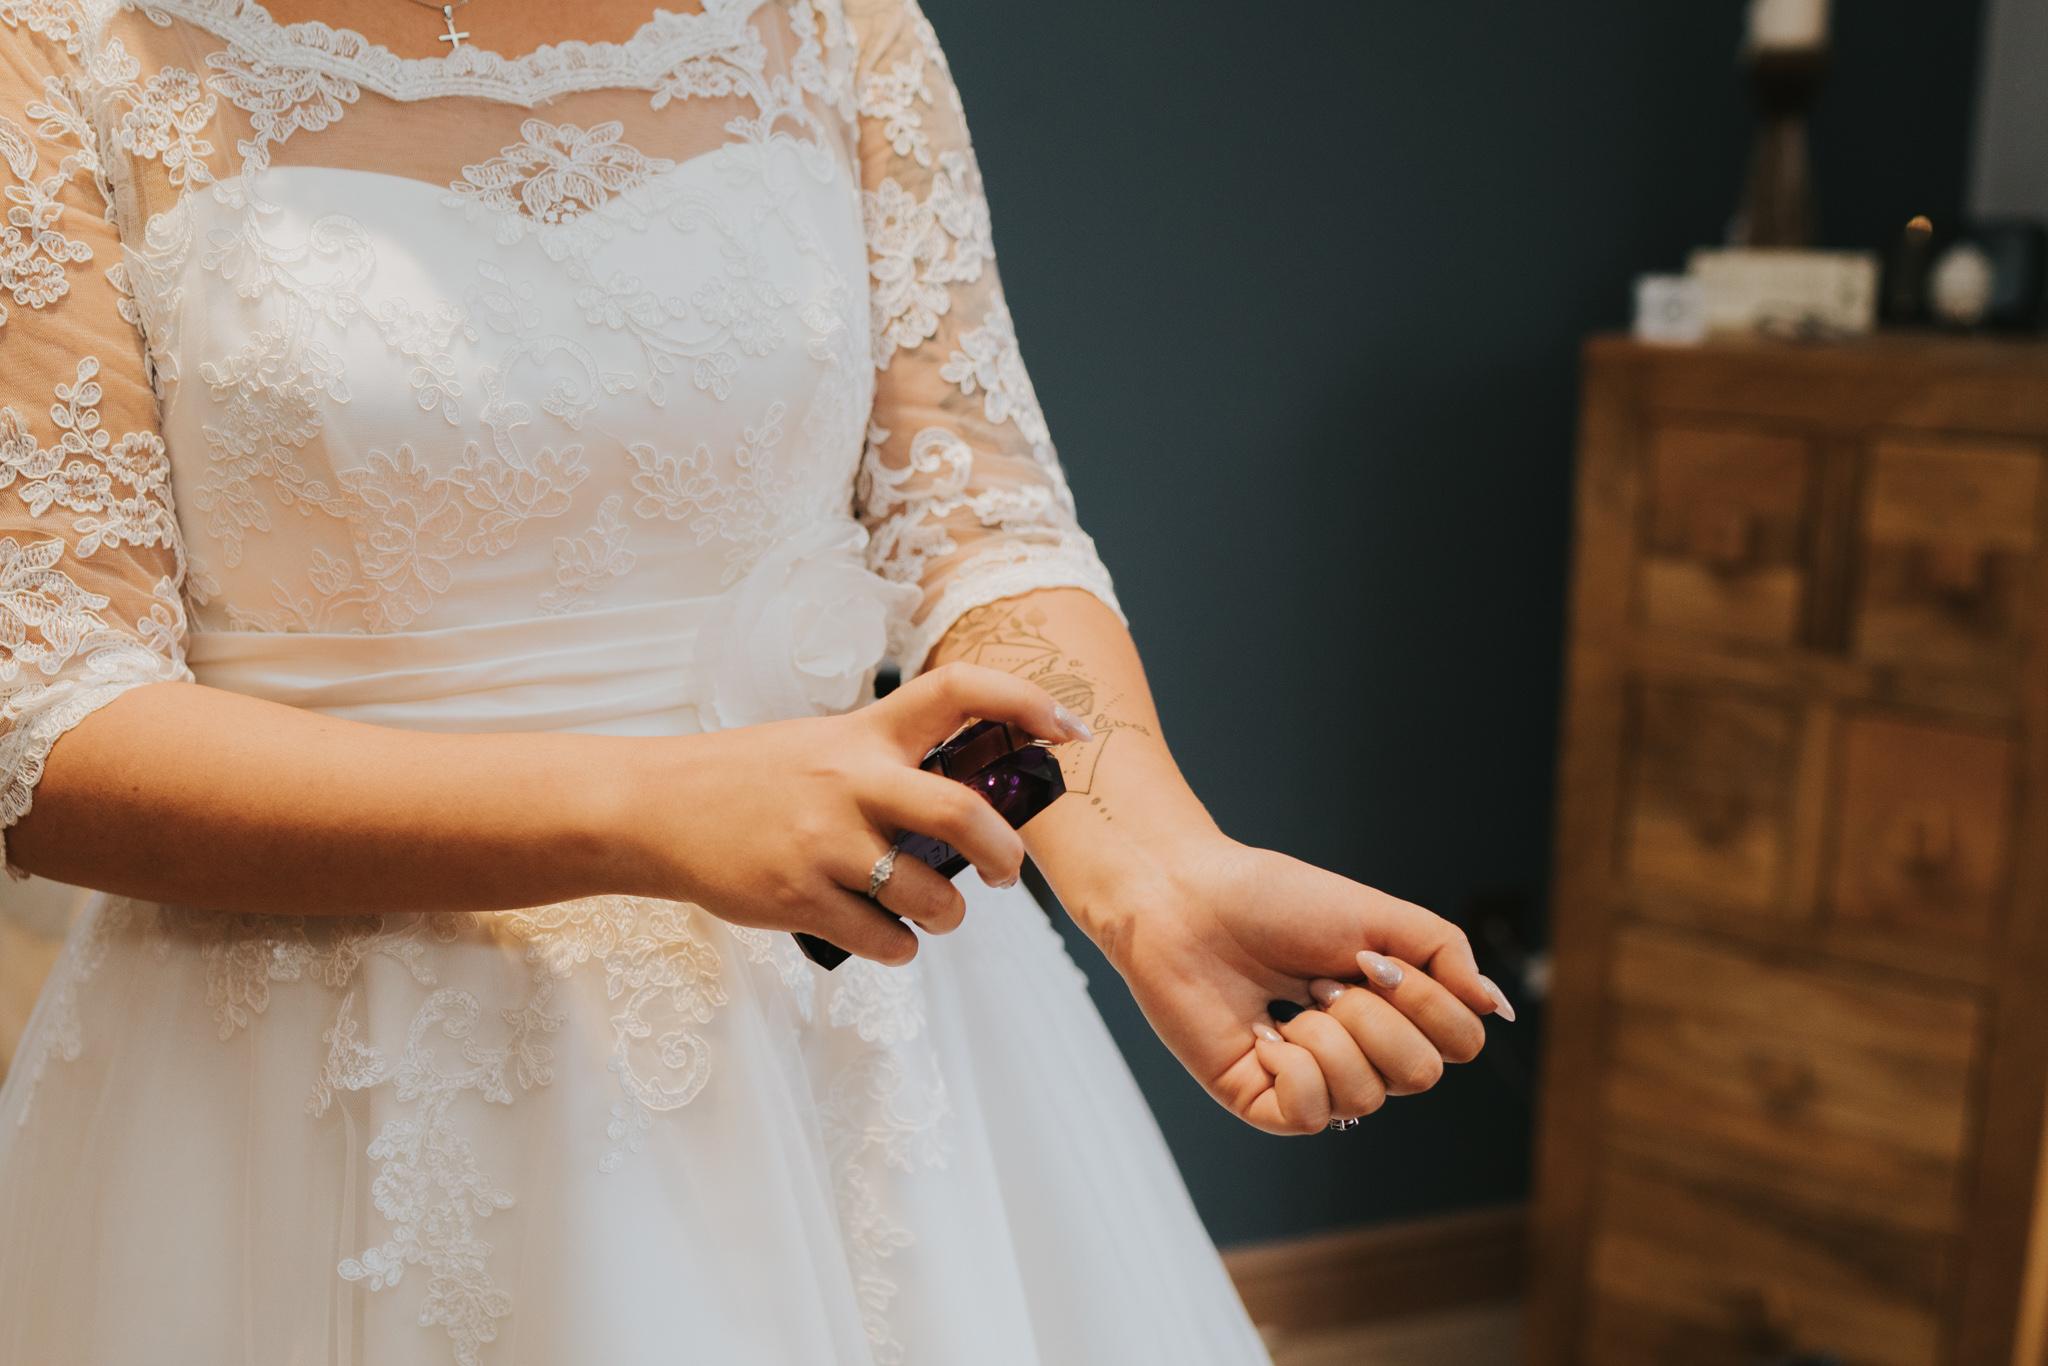 rhia-james-rustic-crabbs-barn-vintage-50s-retro-wedding-grace-elizabeth-colchester-essex-alternative-relaxed-wedding-family-photography-devon-suffolk-norfolk-essex (38 of 138).jpg